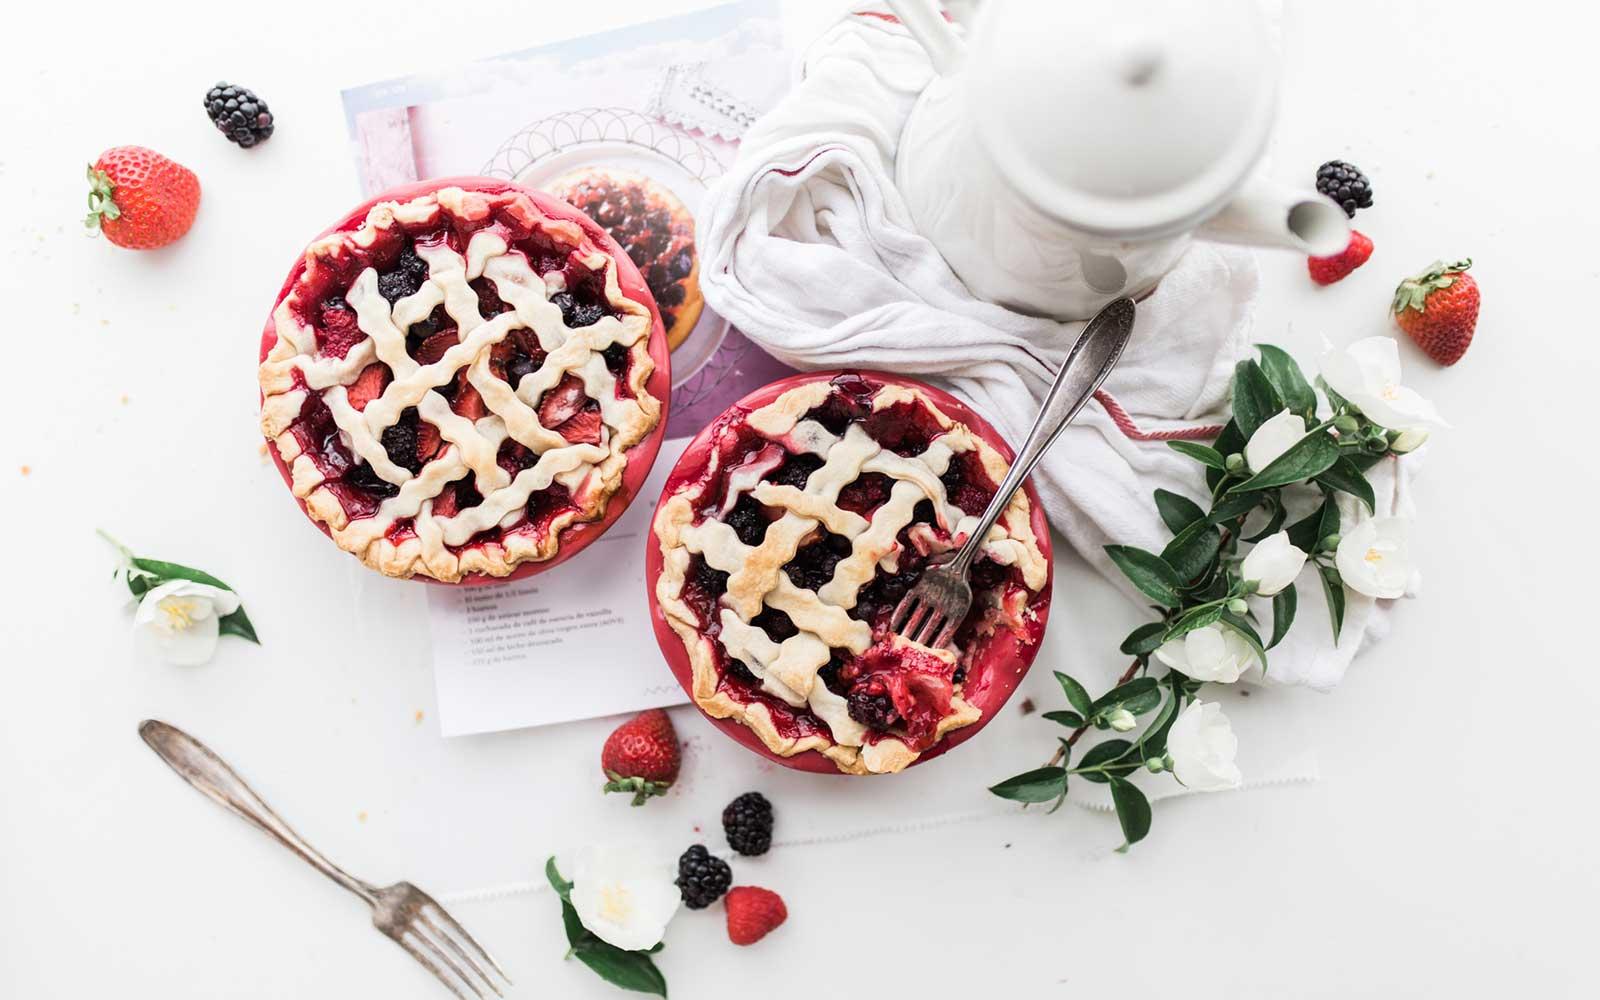 Rustic raspberry tart